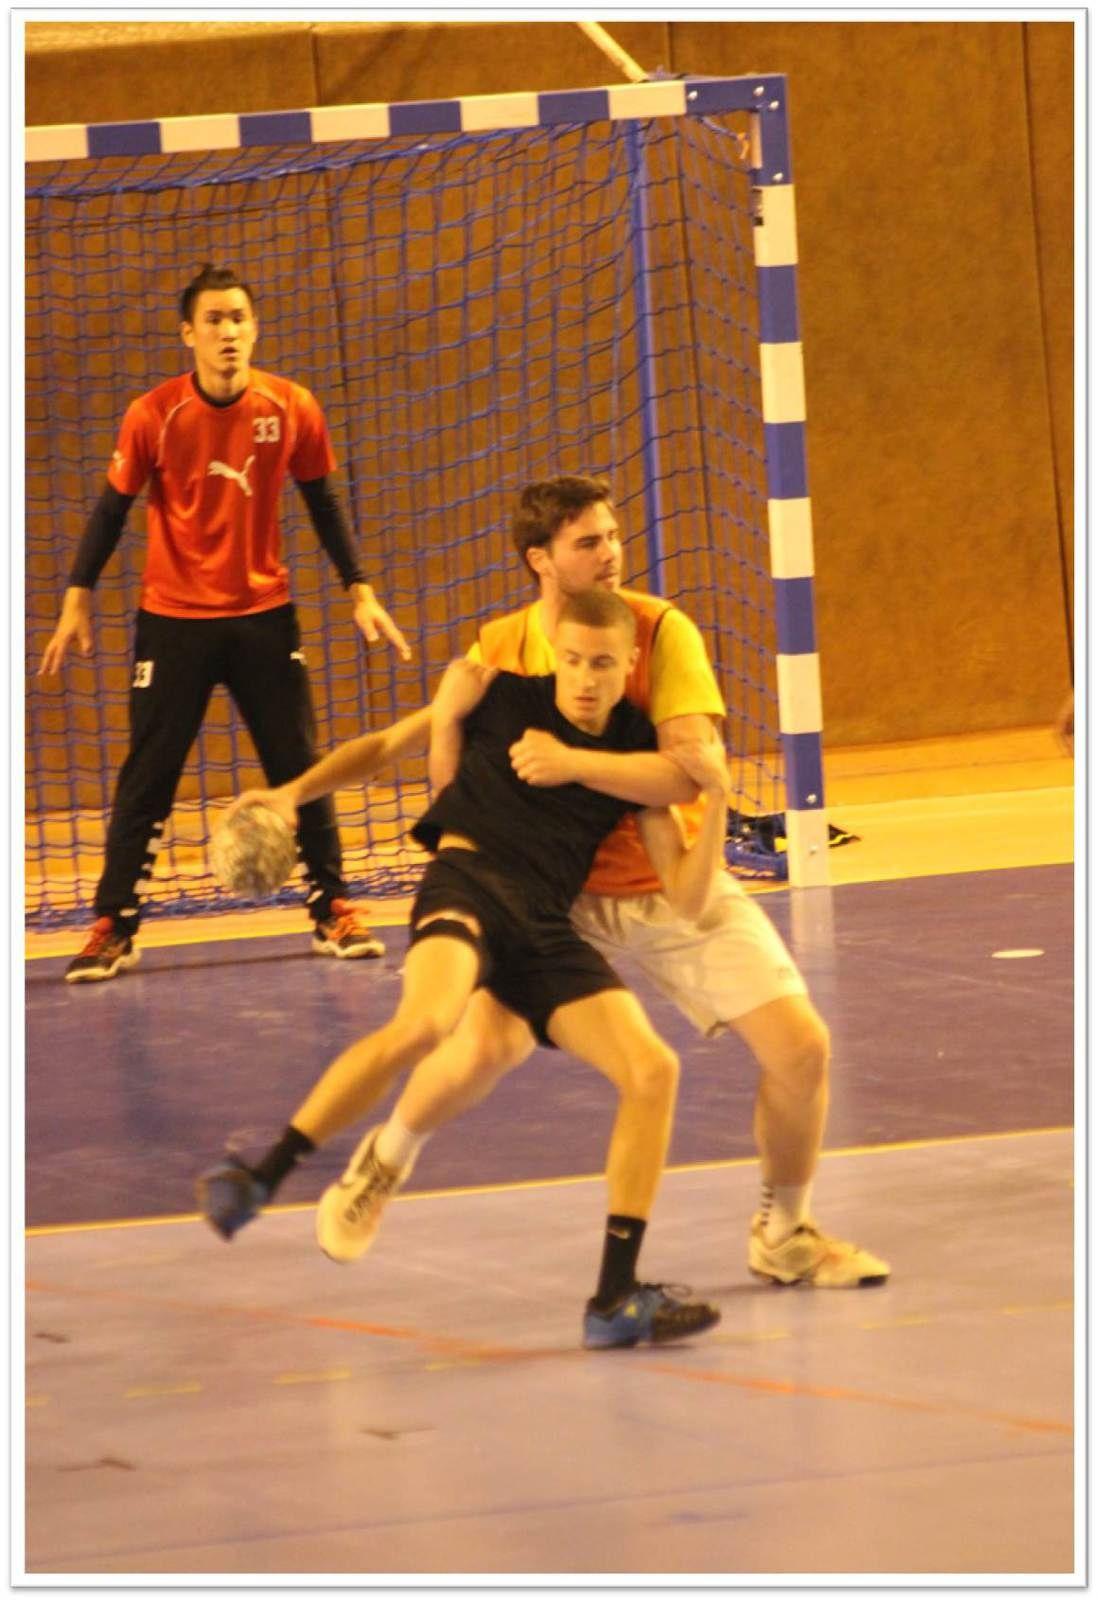 THBMLV 2 vs LA CAUDACIENNE (Prépa Séniors - 23.09.2015)